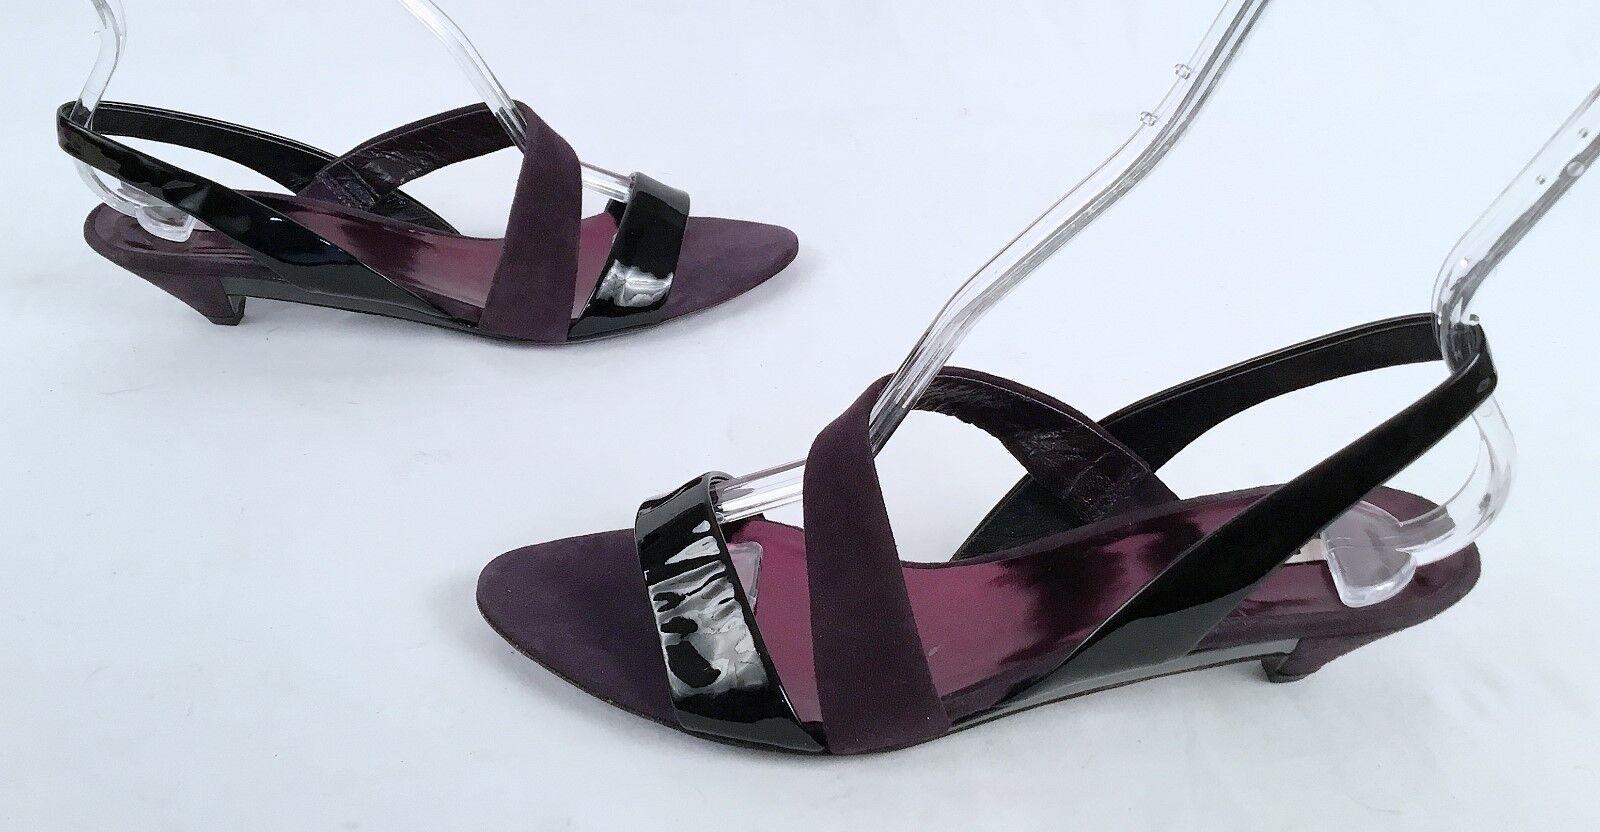 senza esitazione! acquista ora! New     MIU MIU Patent Leather Suede Strappy Sandals Dimensione 7.5  675-(P31)  consegna rapida